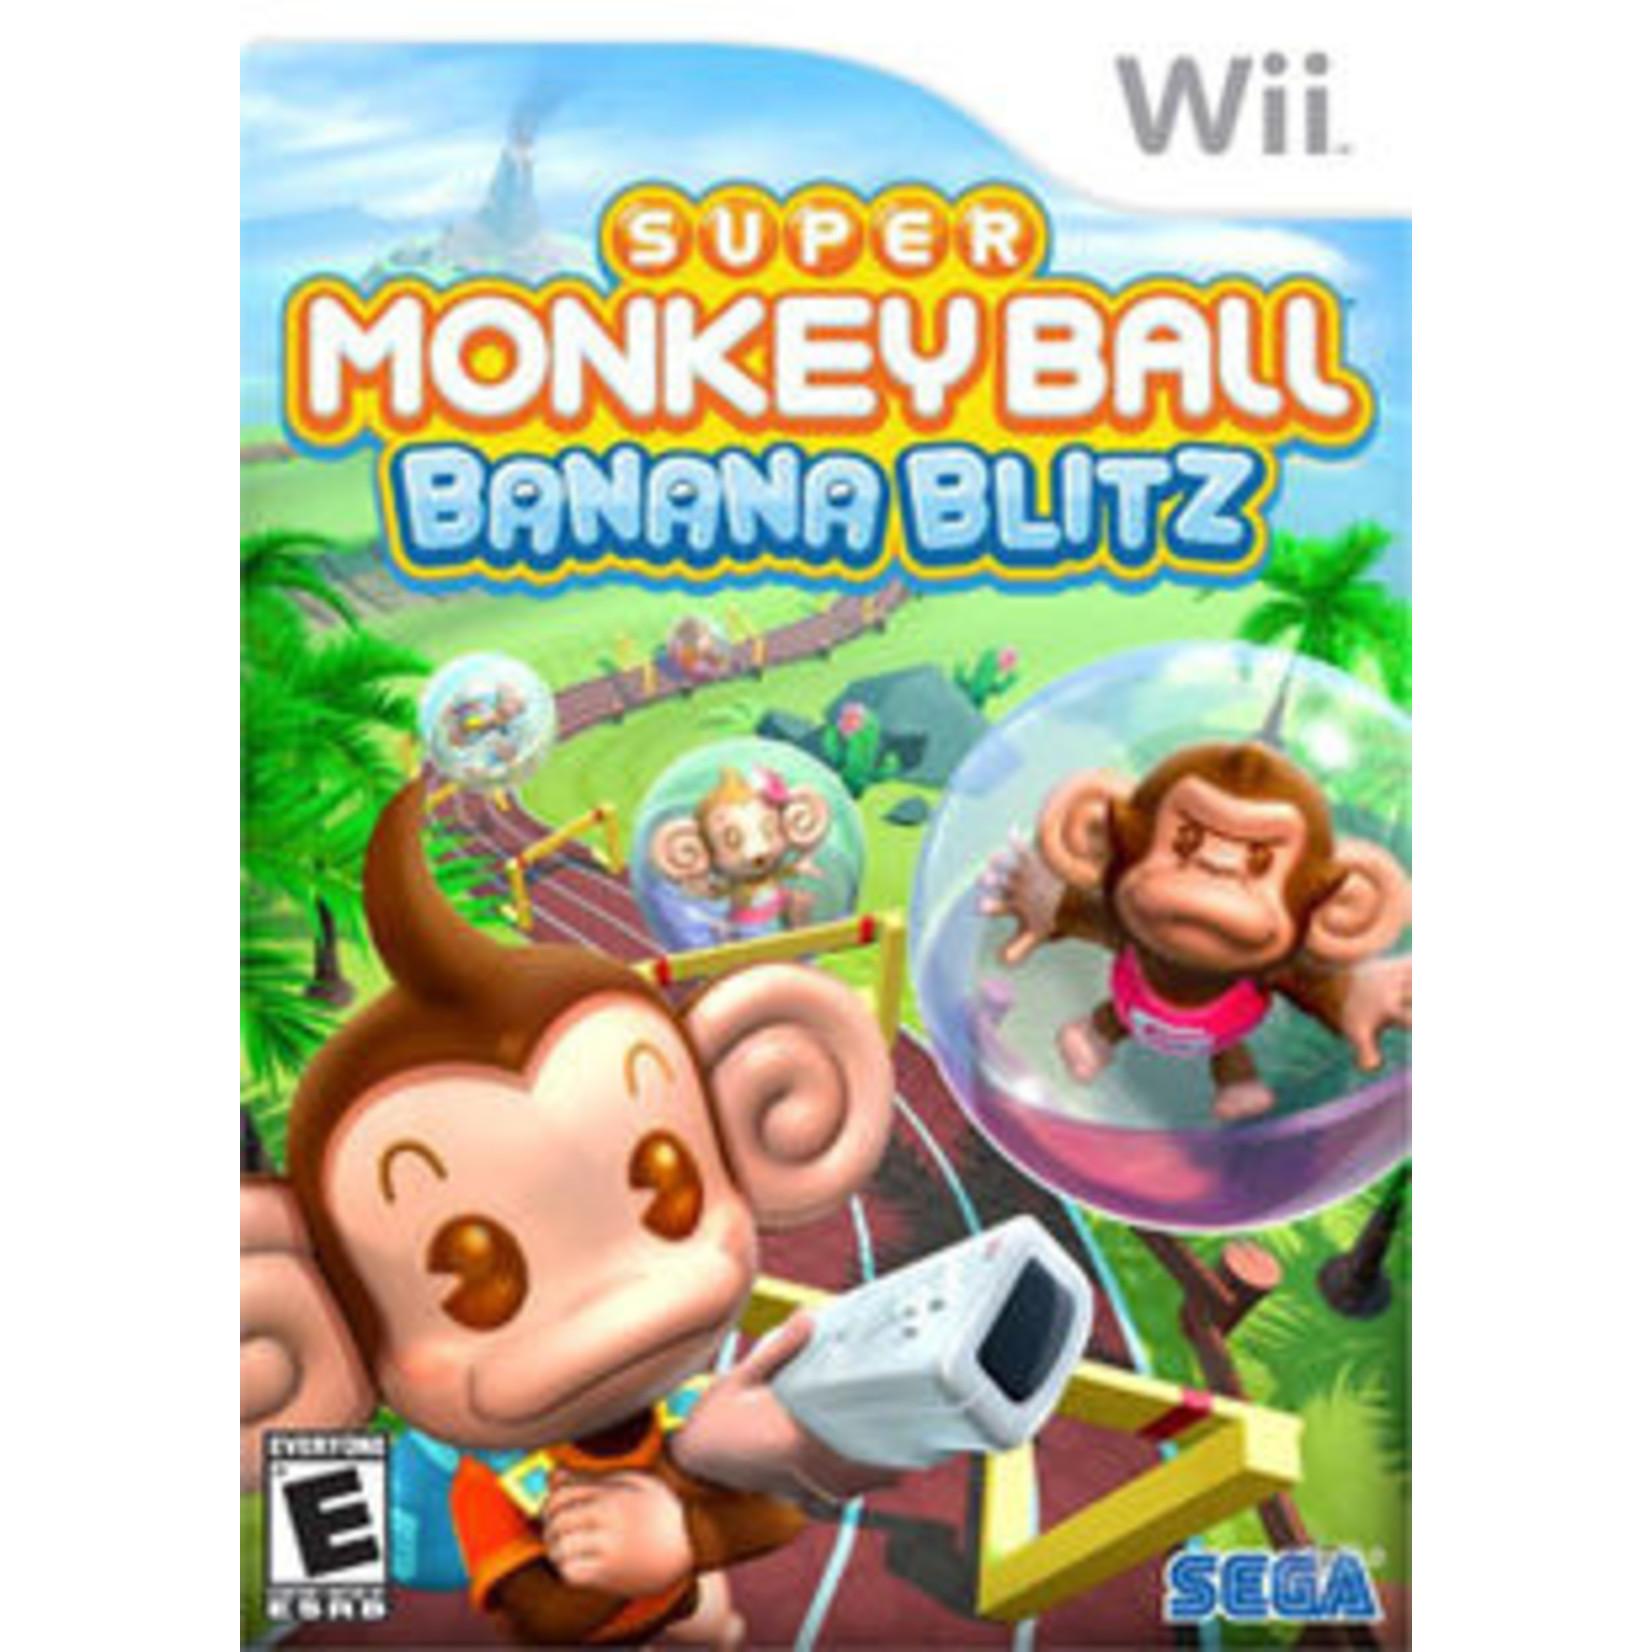 WIIUSD-SUPER MONKEY BALL BANANA BLITZ